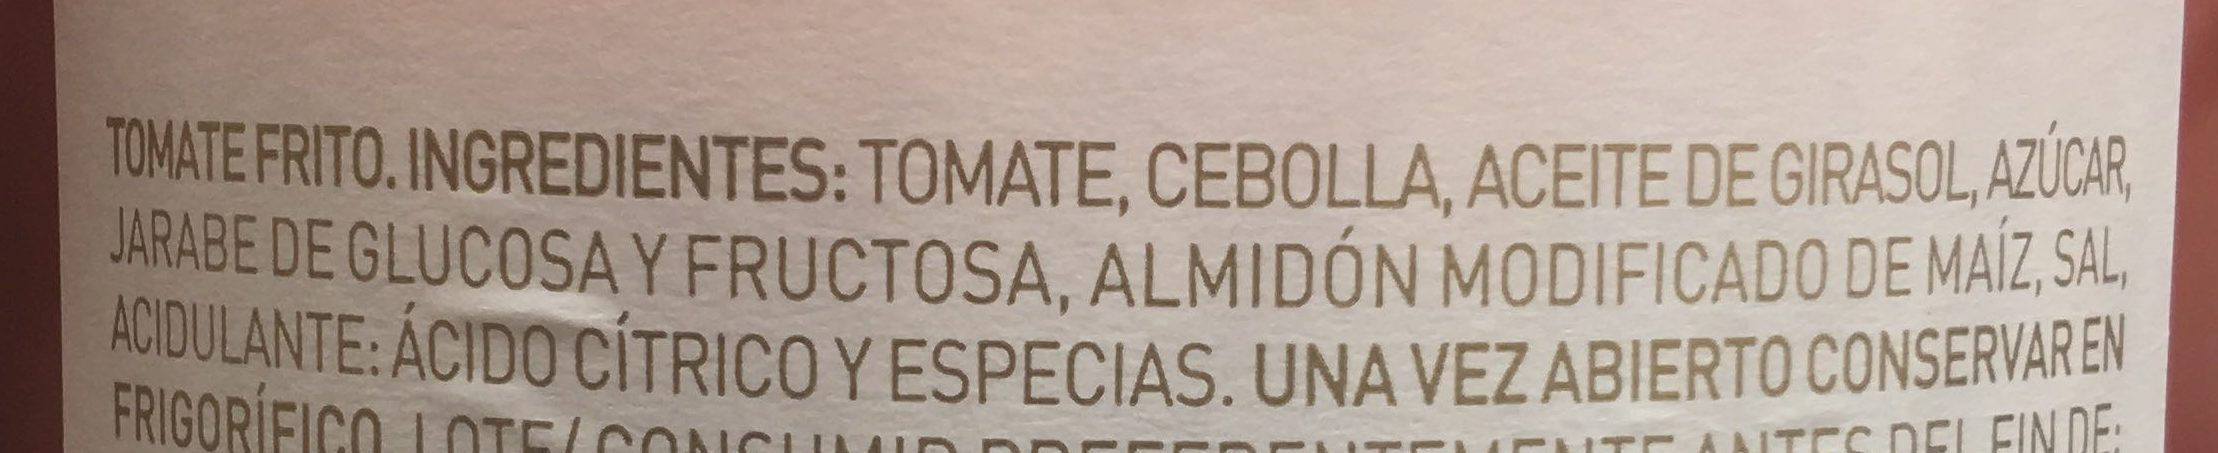 Tomate Frito - Ingrediënten - es